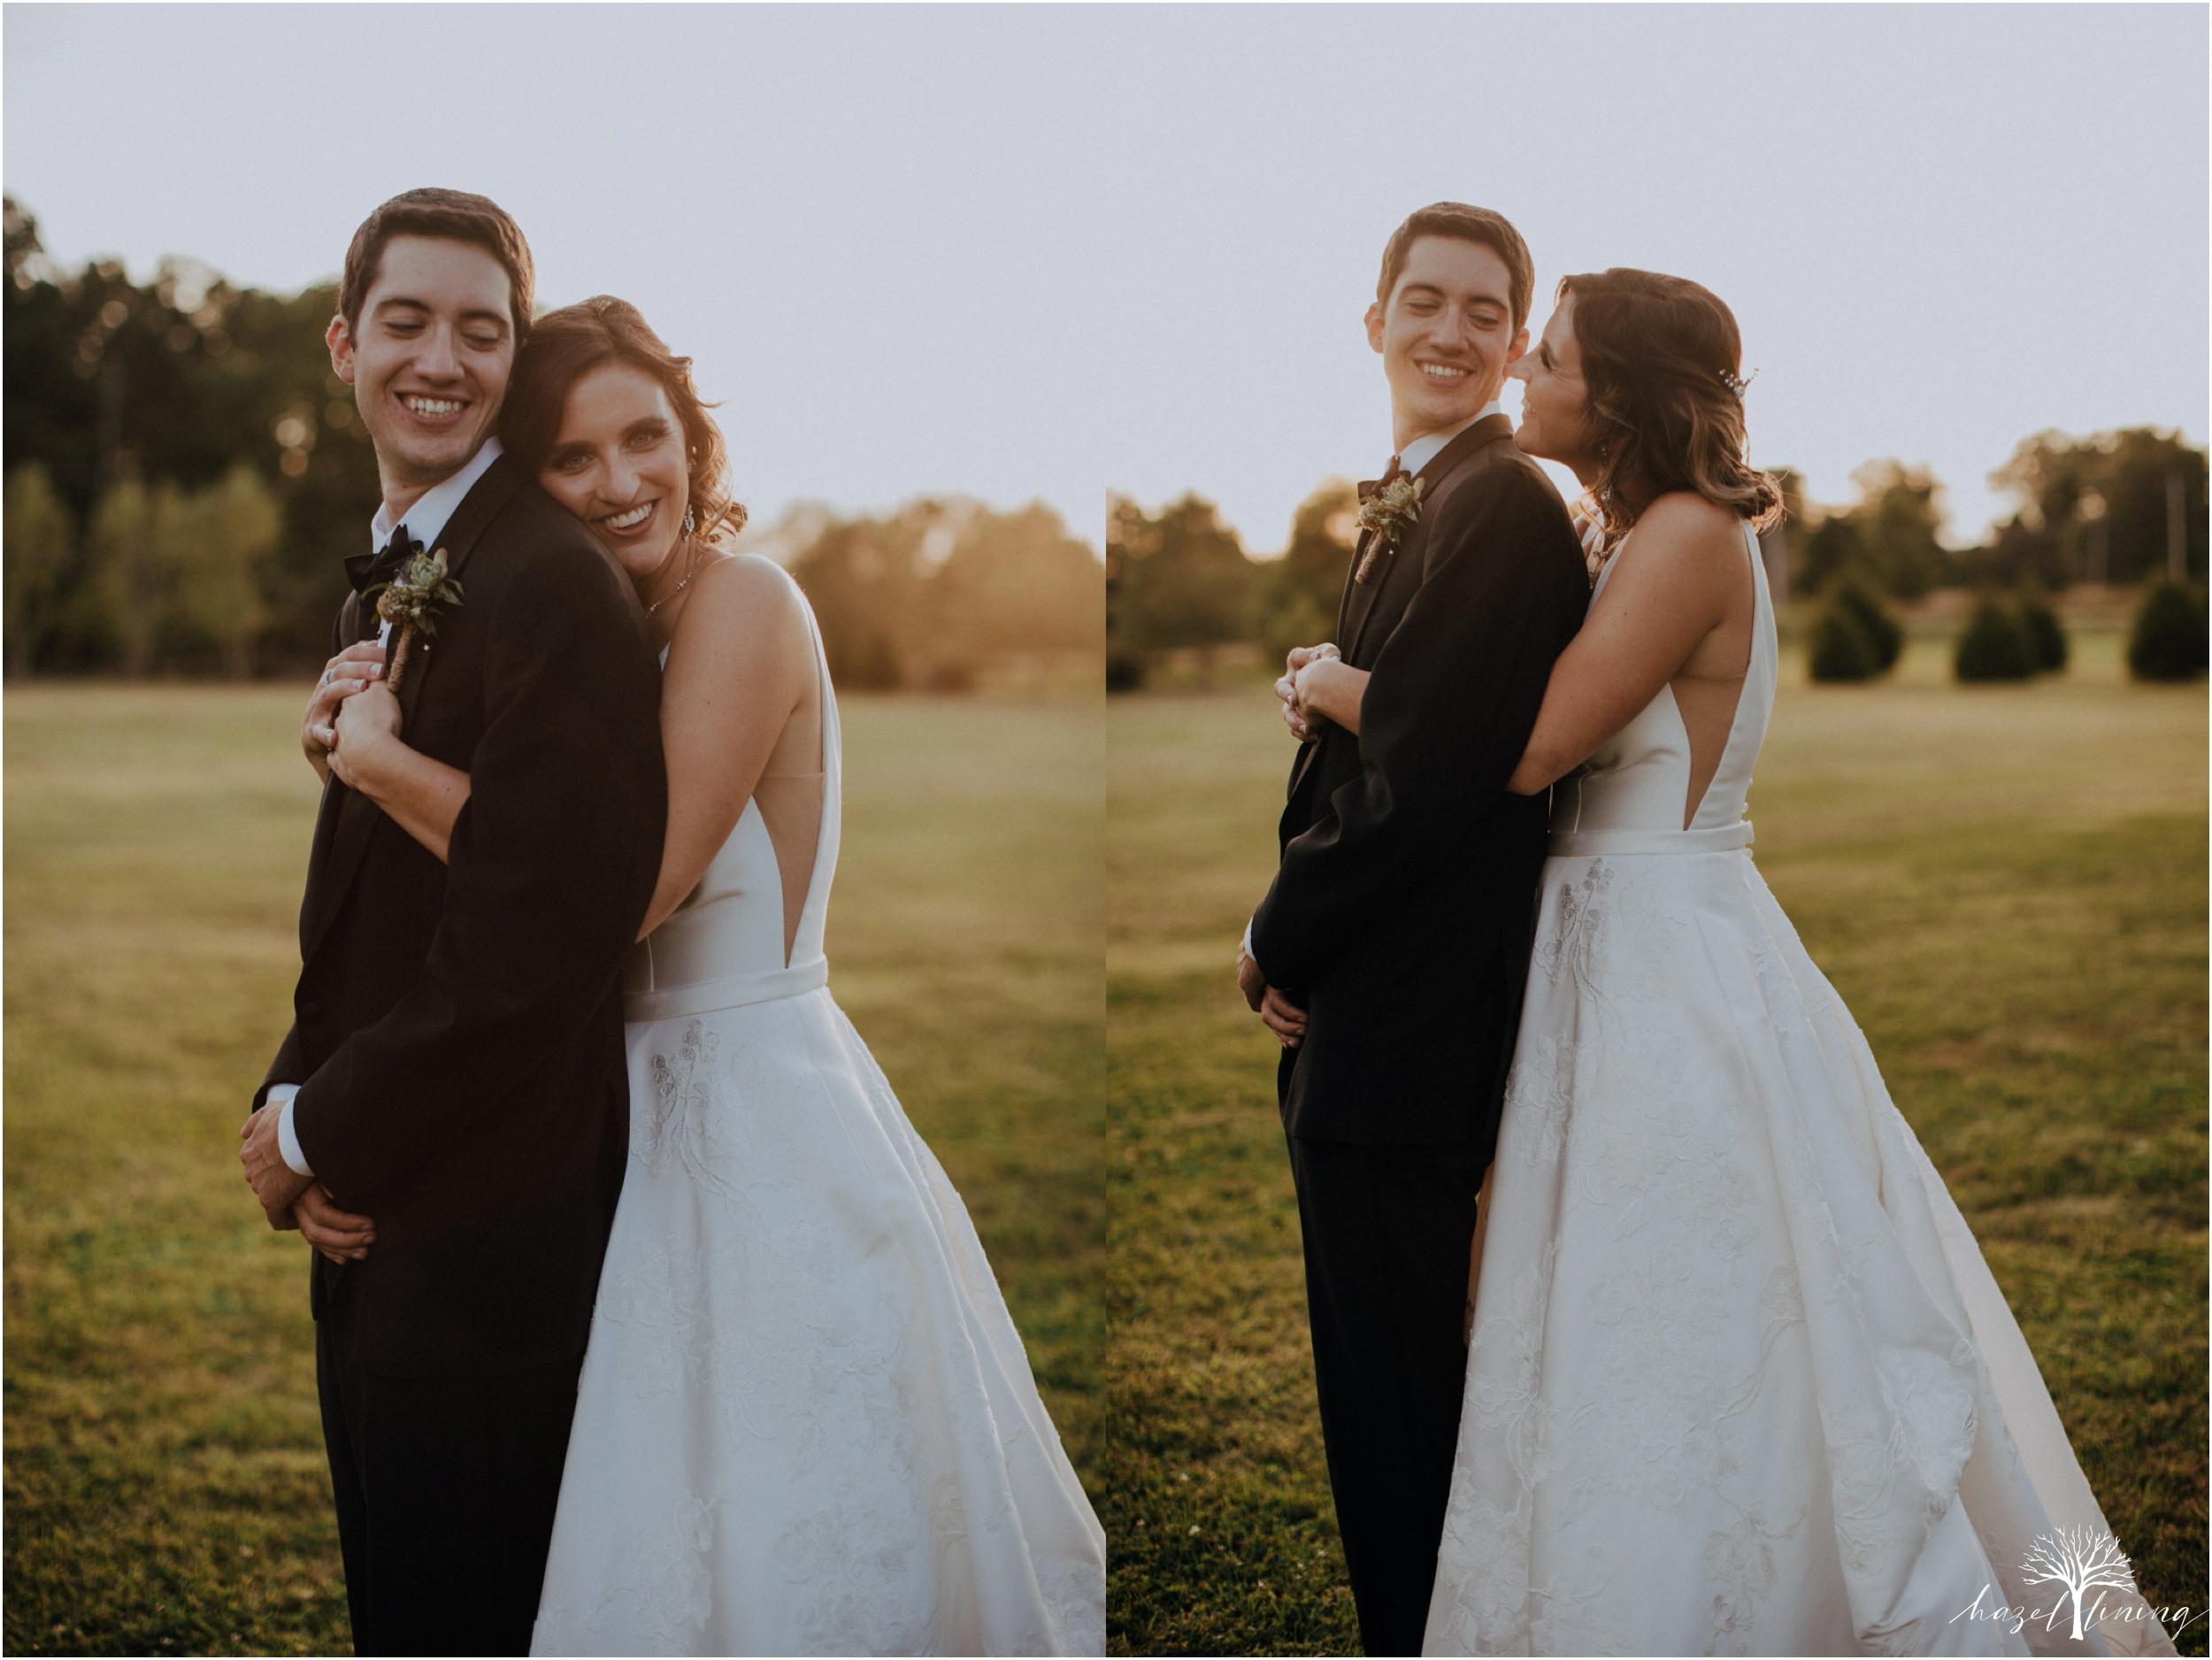 maureen-hepner-anthony-giordano-rose-bank-winery-newtow-pennsylvania-luxury-summer-wedding-hazel-lining-photography-destination-elopement-wedding-engagement-photography_0173.jpg